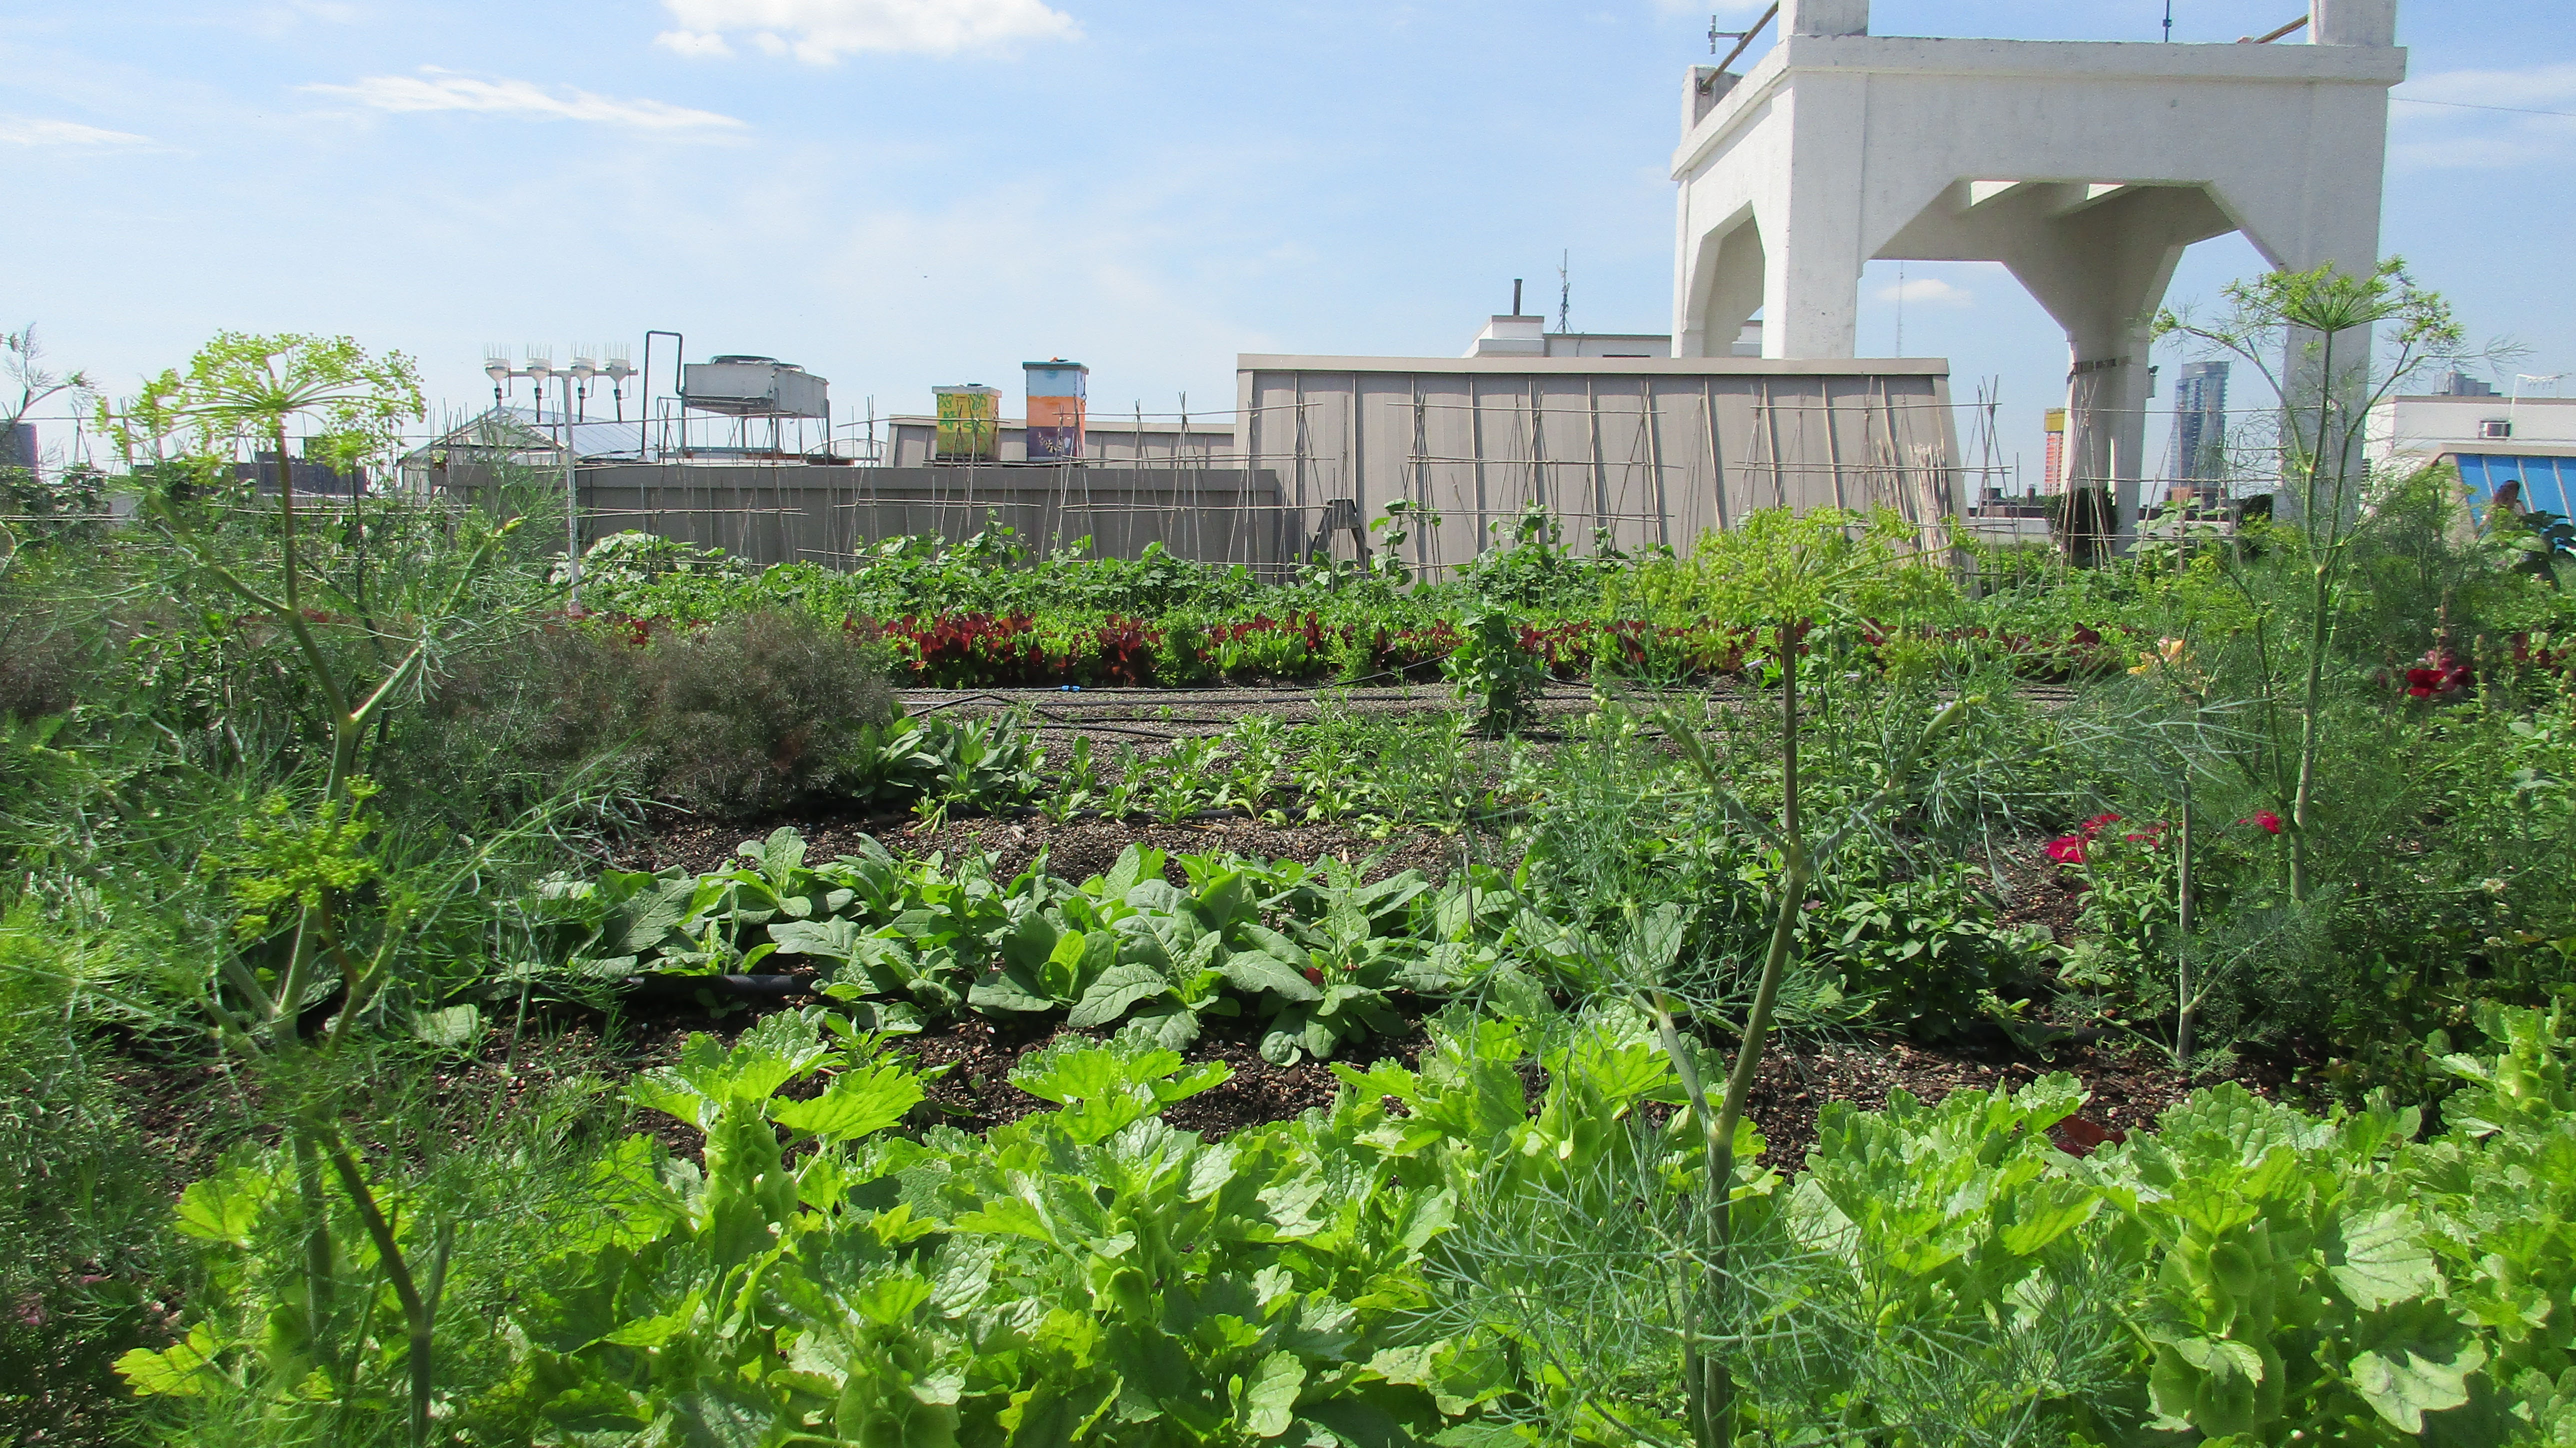 The view at Brooklyn Grange urban farm